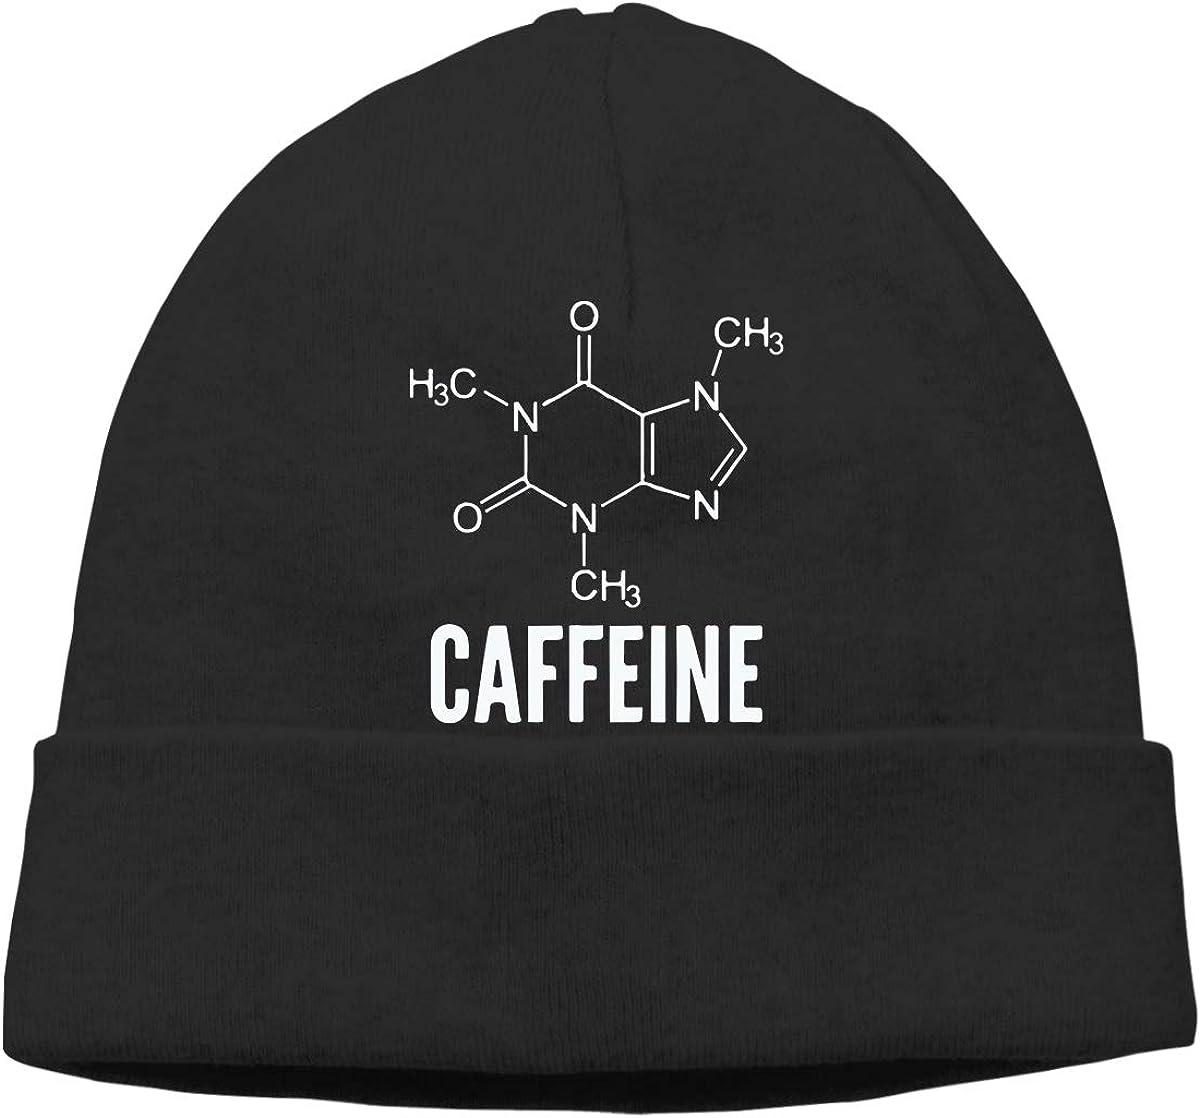 GDSG5/&4 Caffeine Molecule Women and Men Helmet Liner Surf Beanie Cap